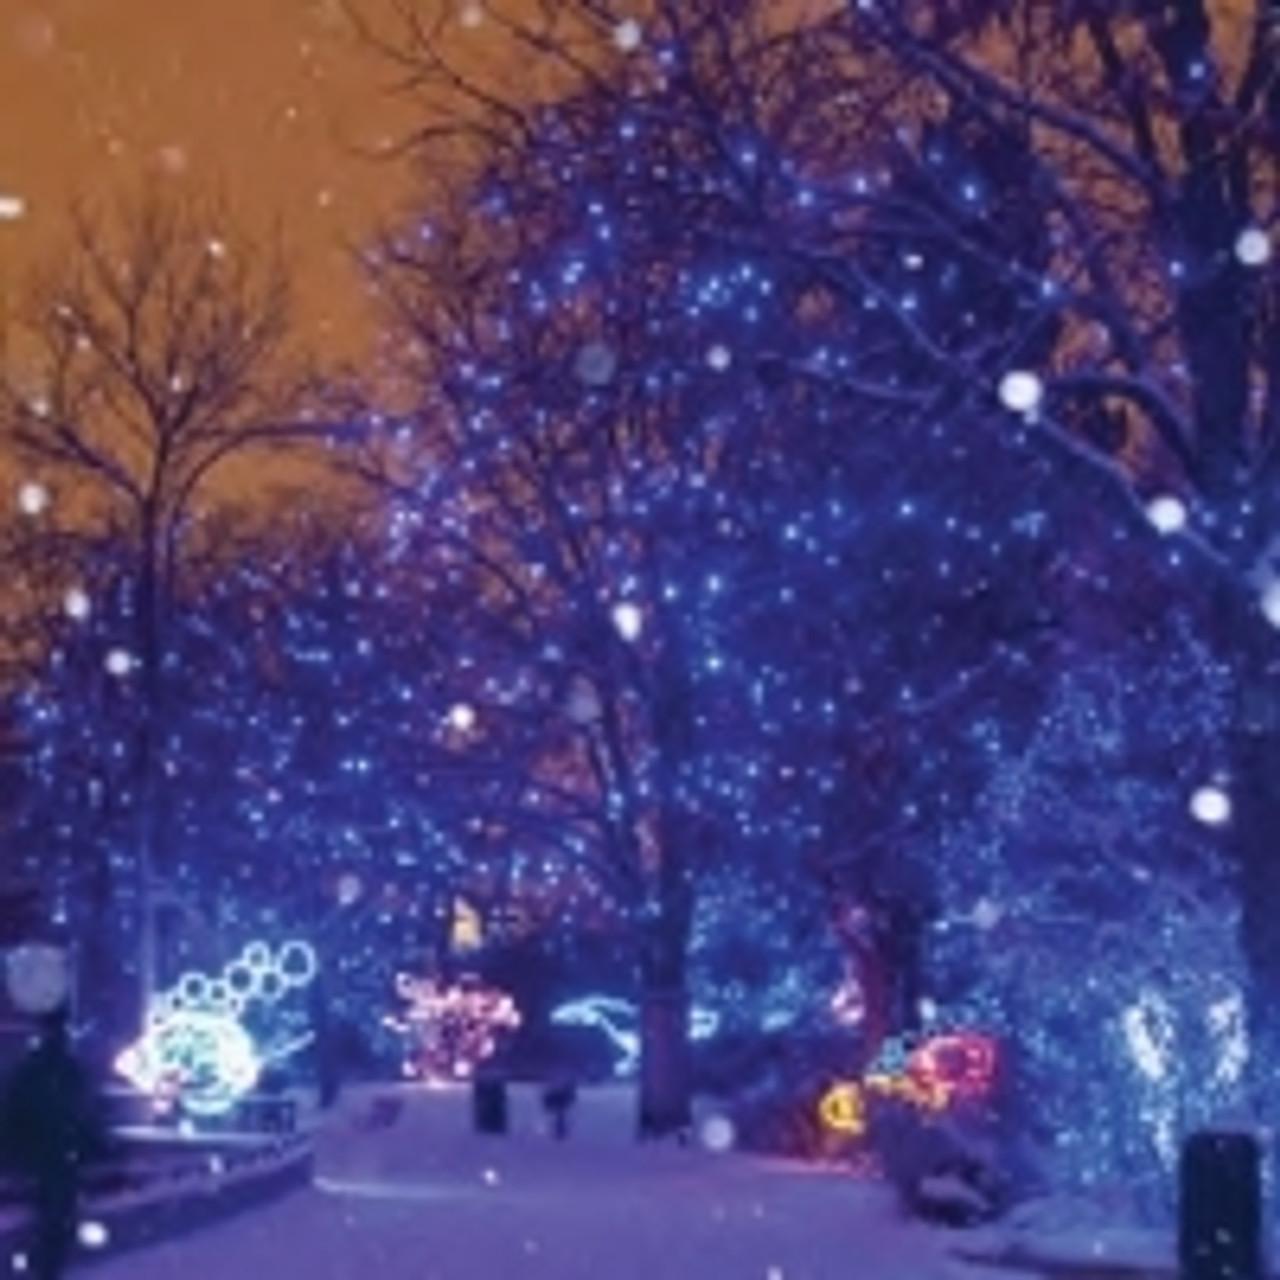 LED Christmas Lights - String Lighting